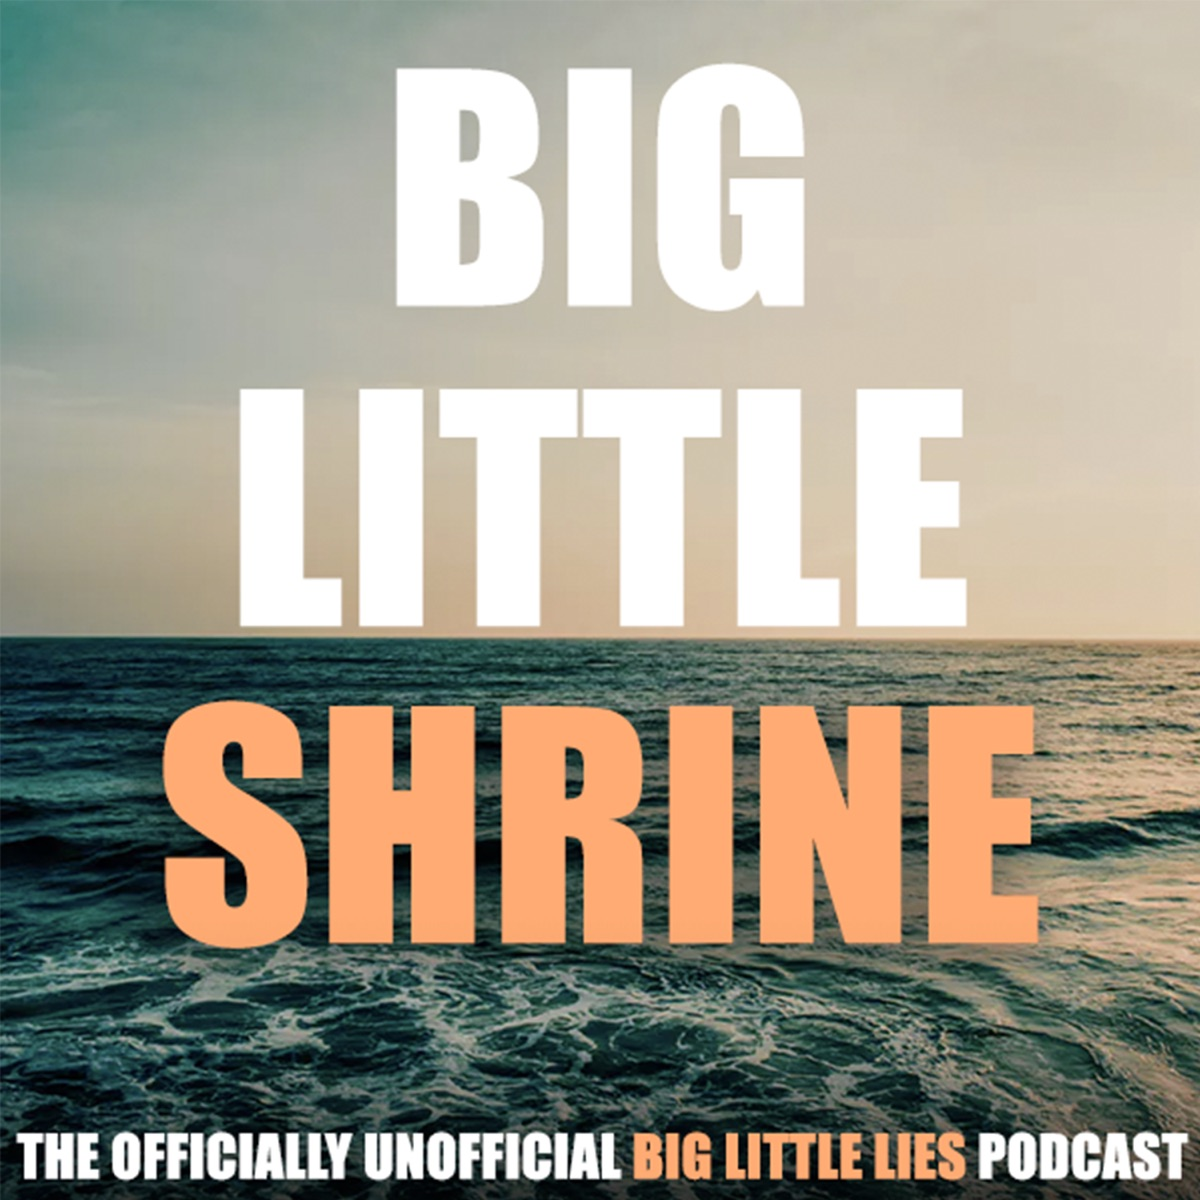 Big Little Shrine